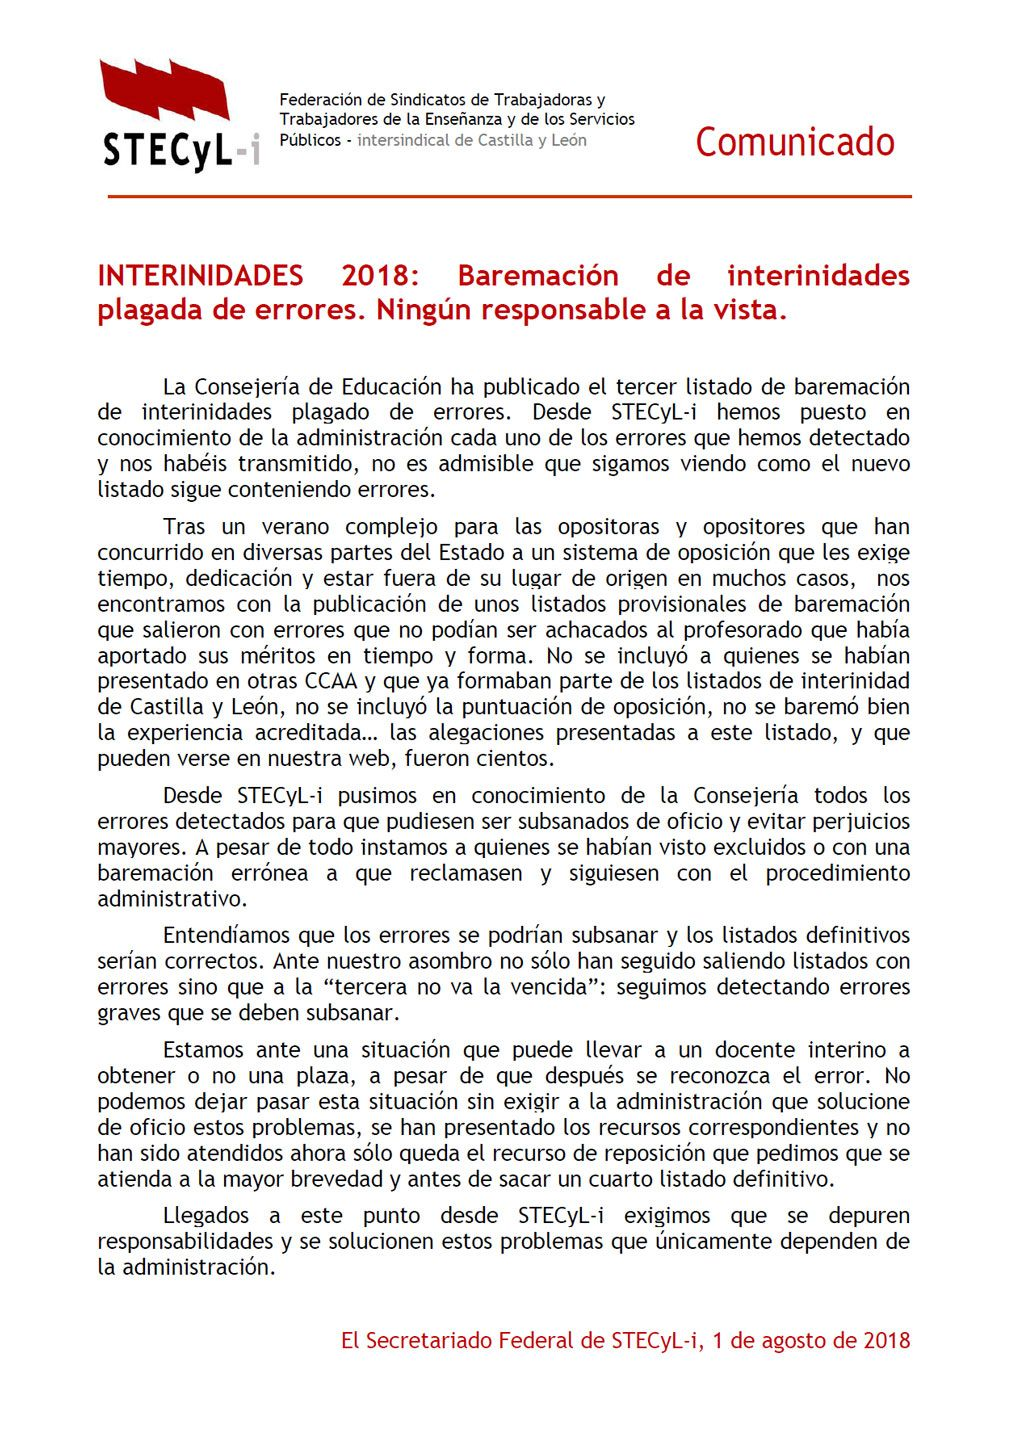 180801-Comunicado-Baremacion-Interinidades-2018